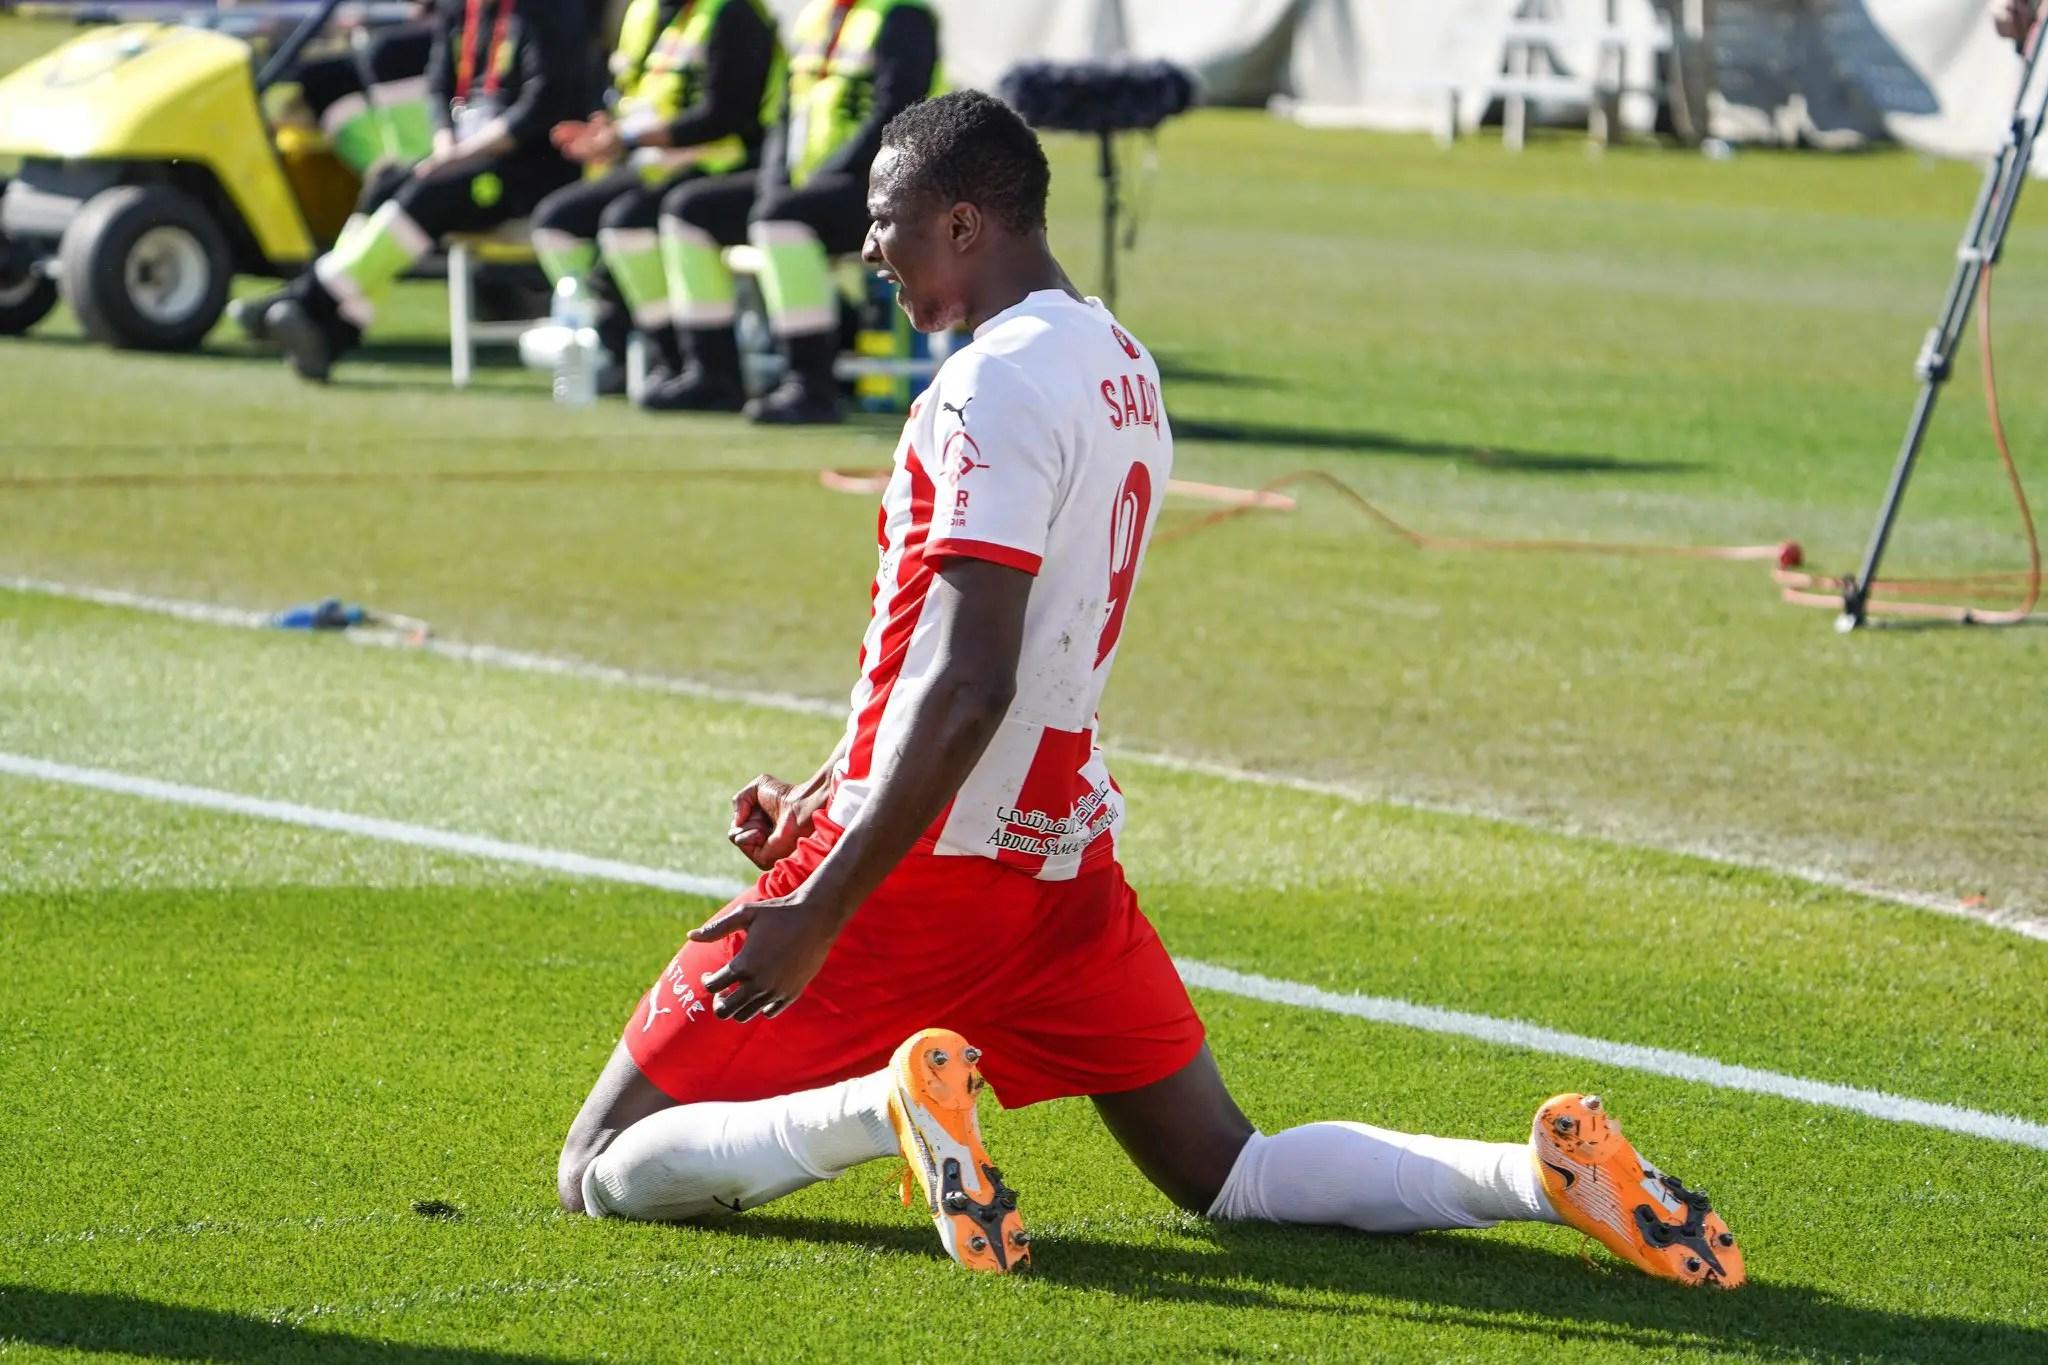 Spanish Segunda: Sadiq Scores, Provides Assist As Almeria Secure Home Win